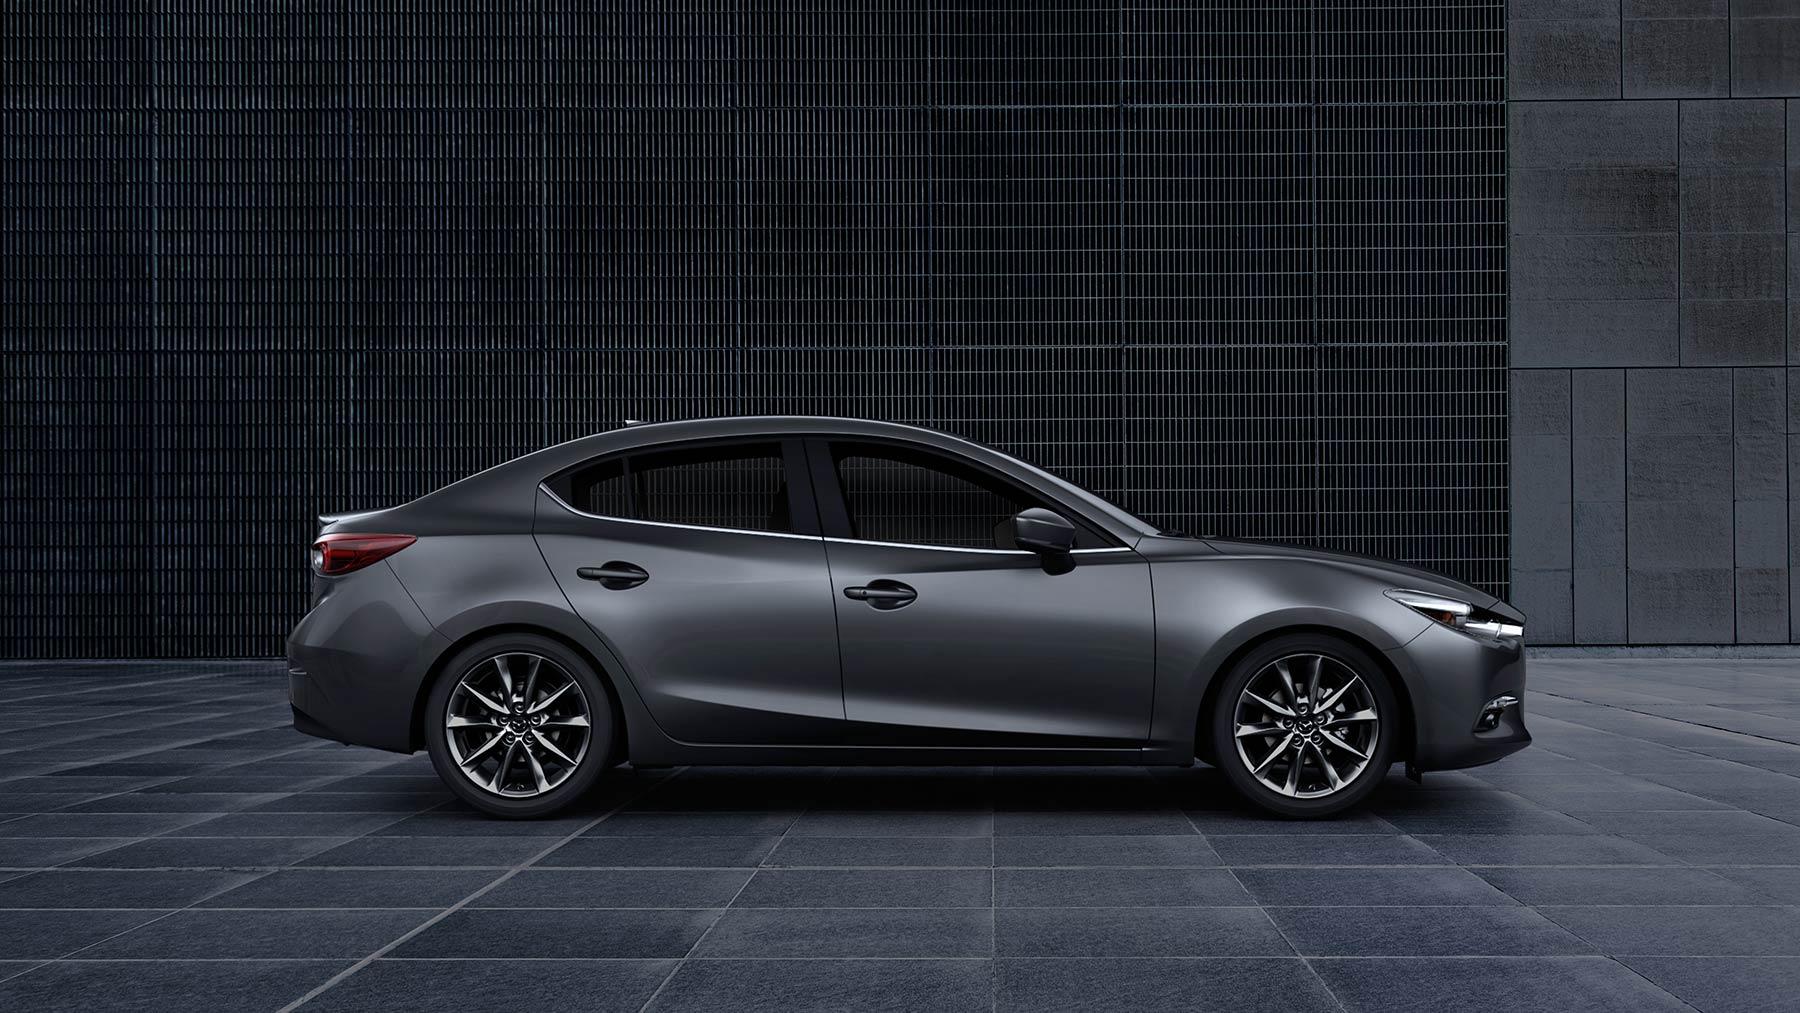 2018 Mazda 3 Power U0026 Handling